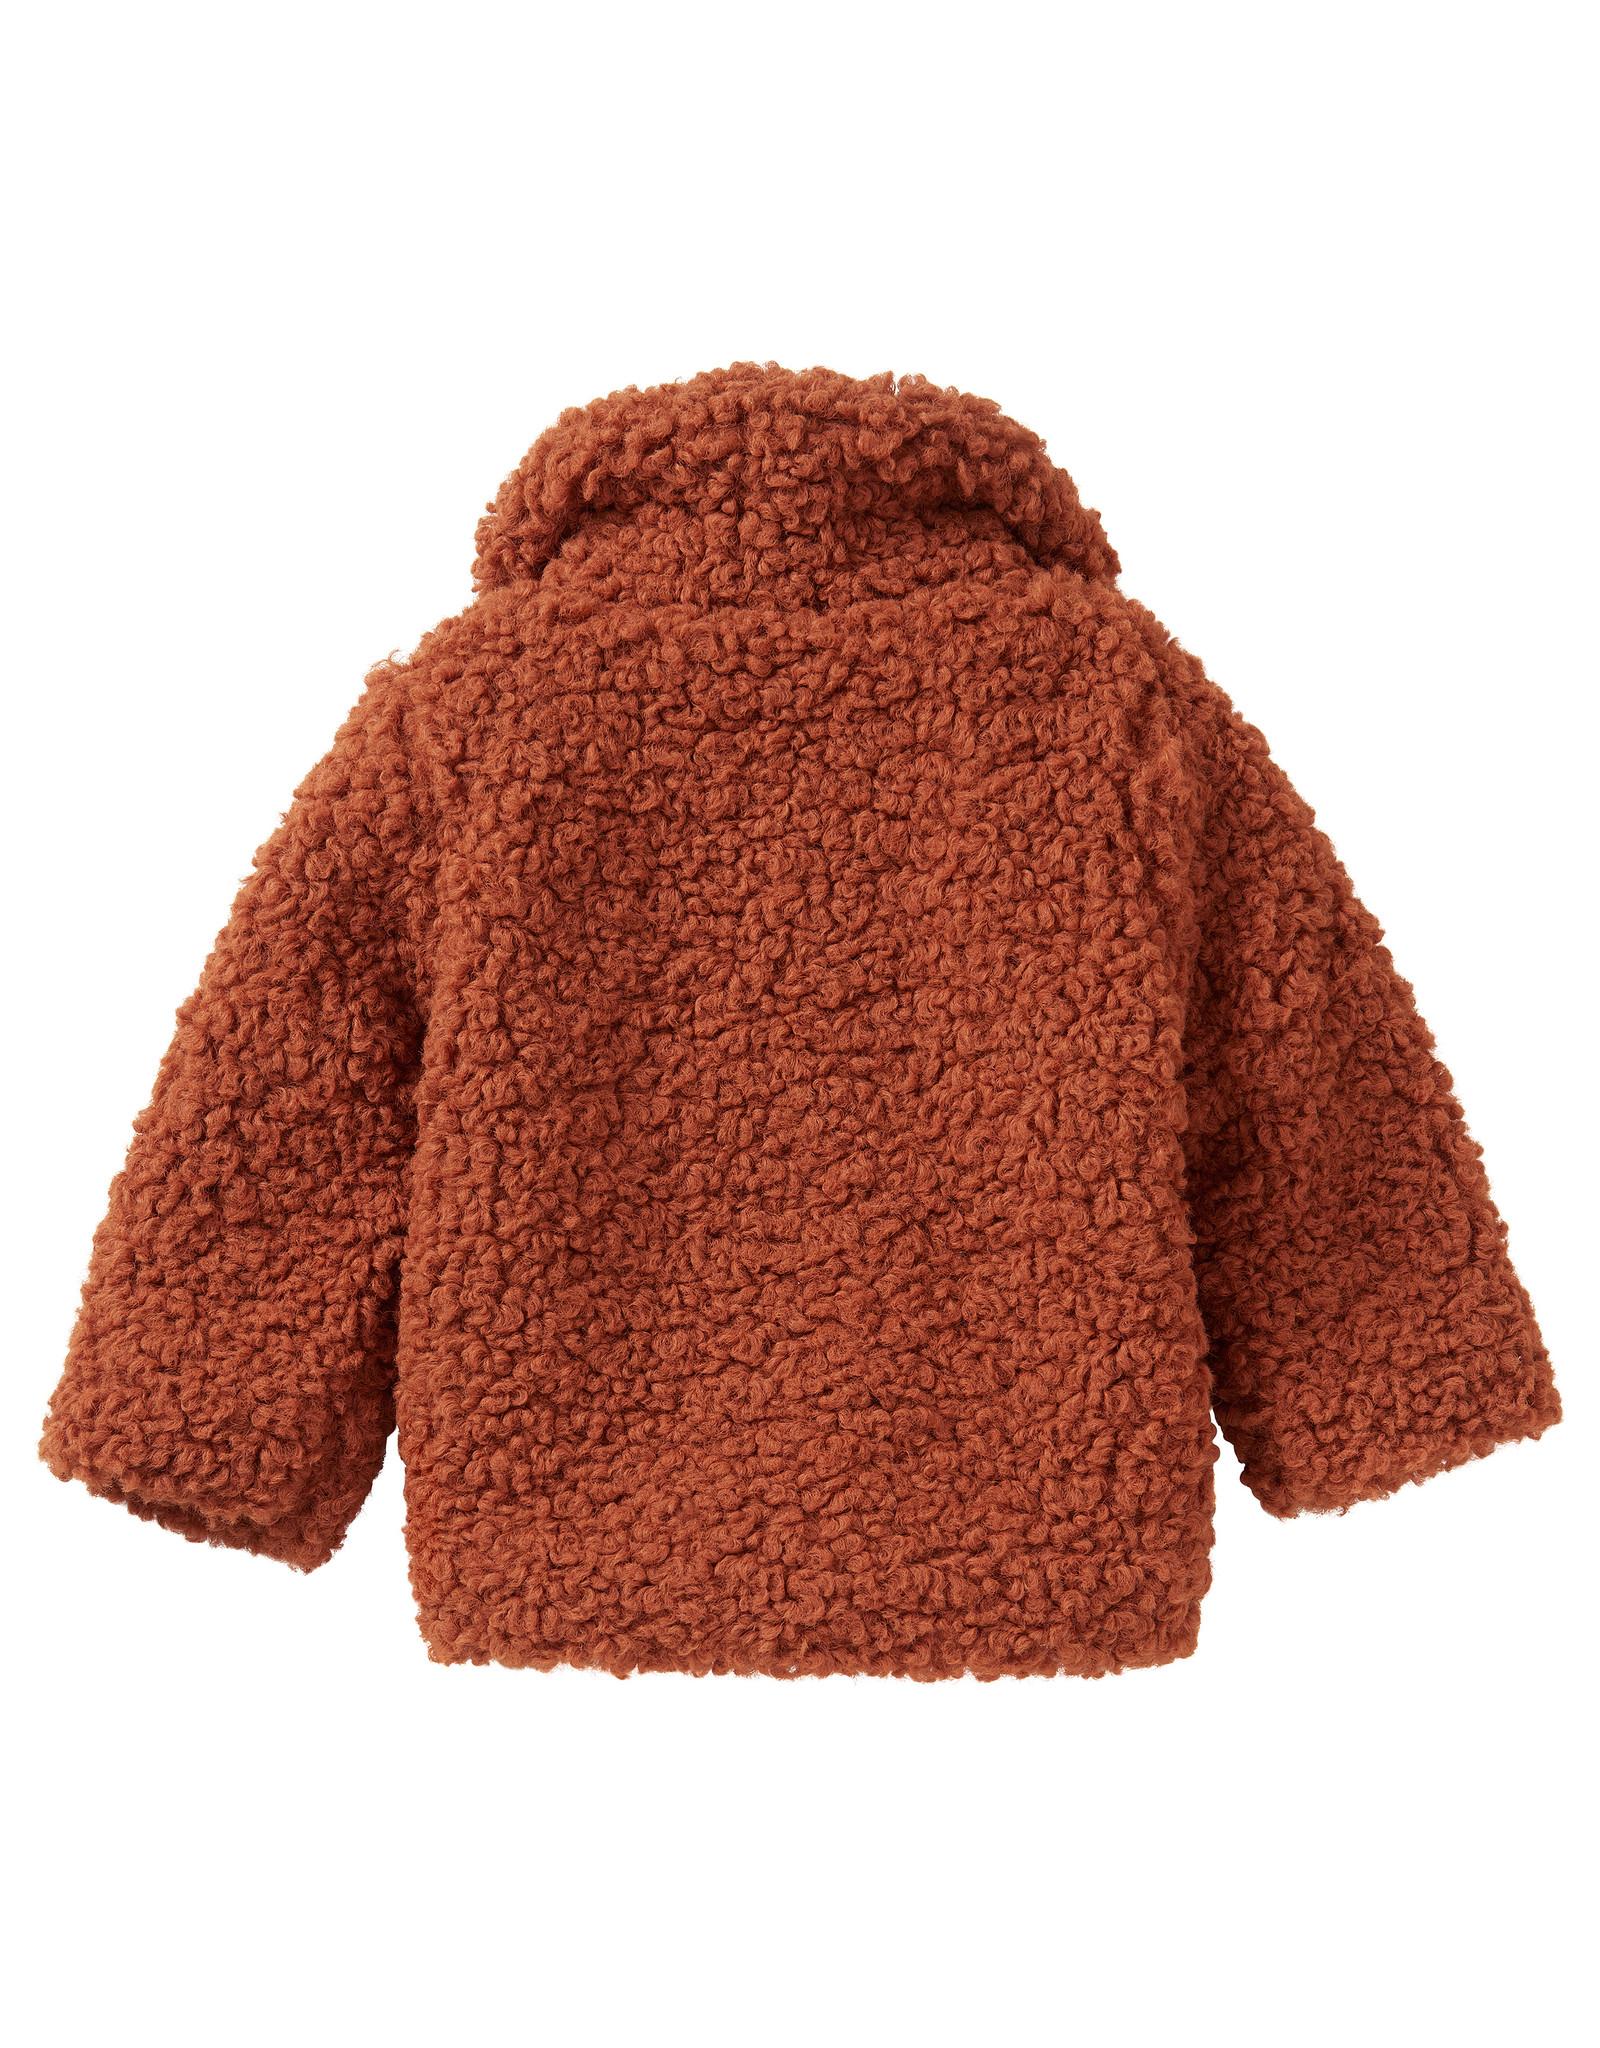 Noppies G Coat LS Lulekani, Rust